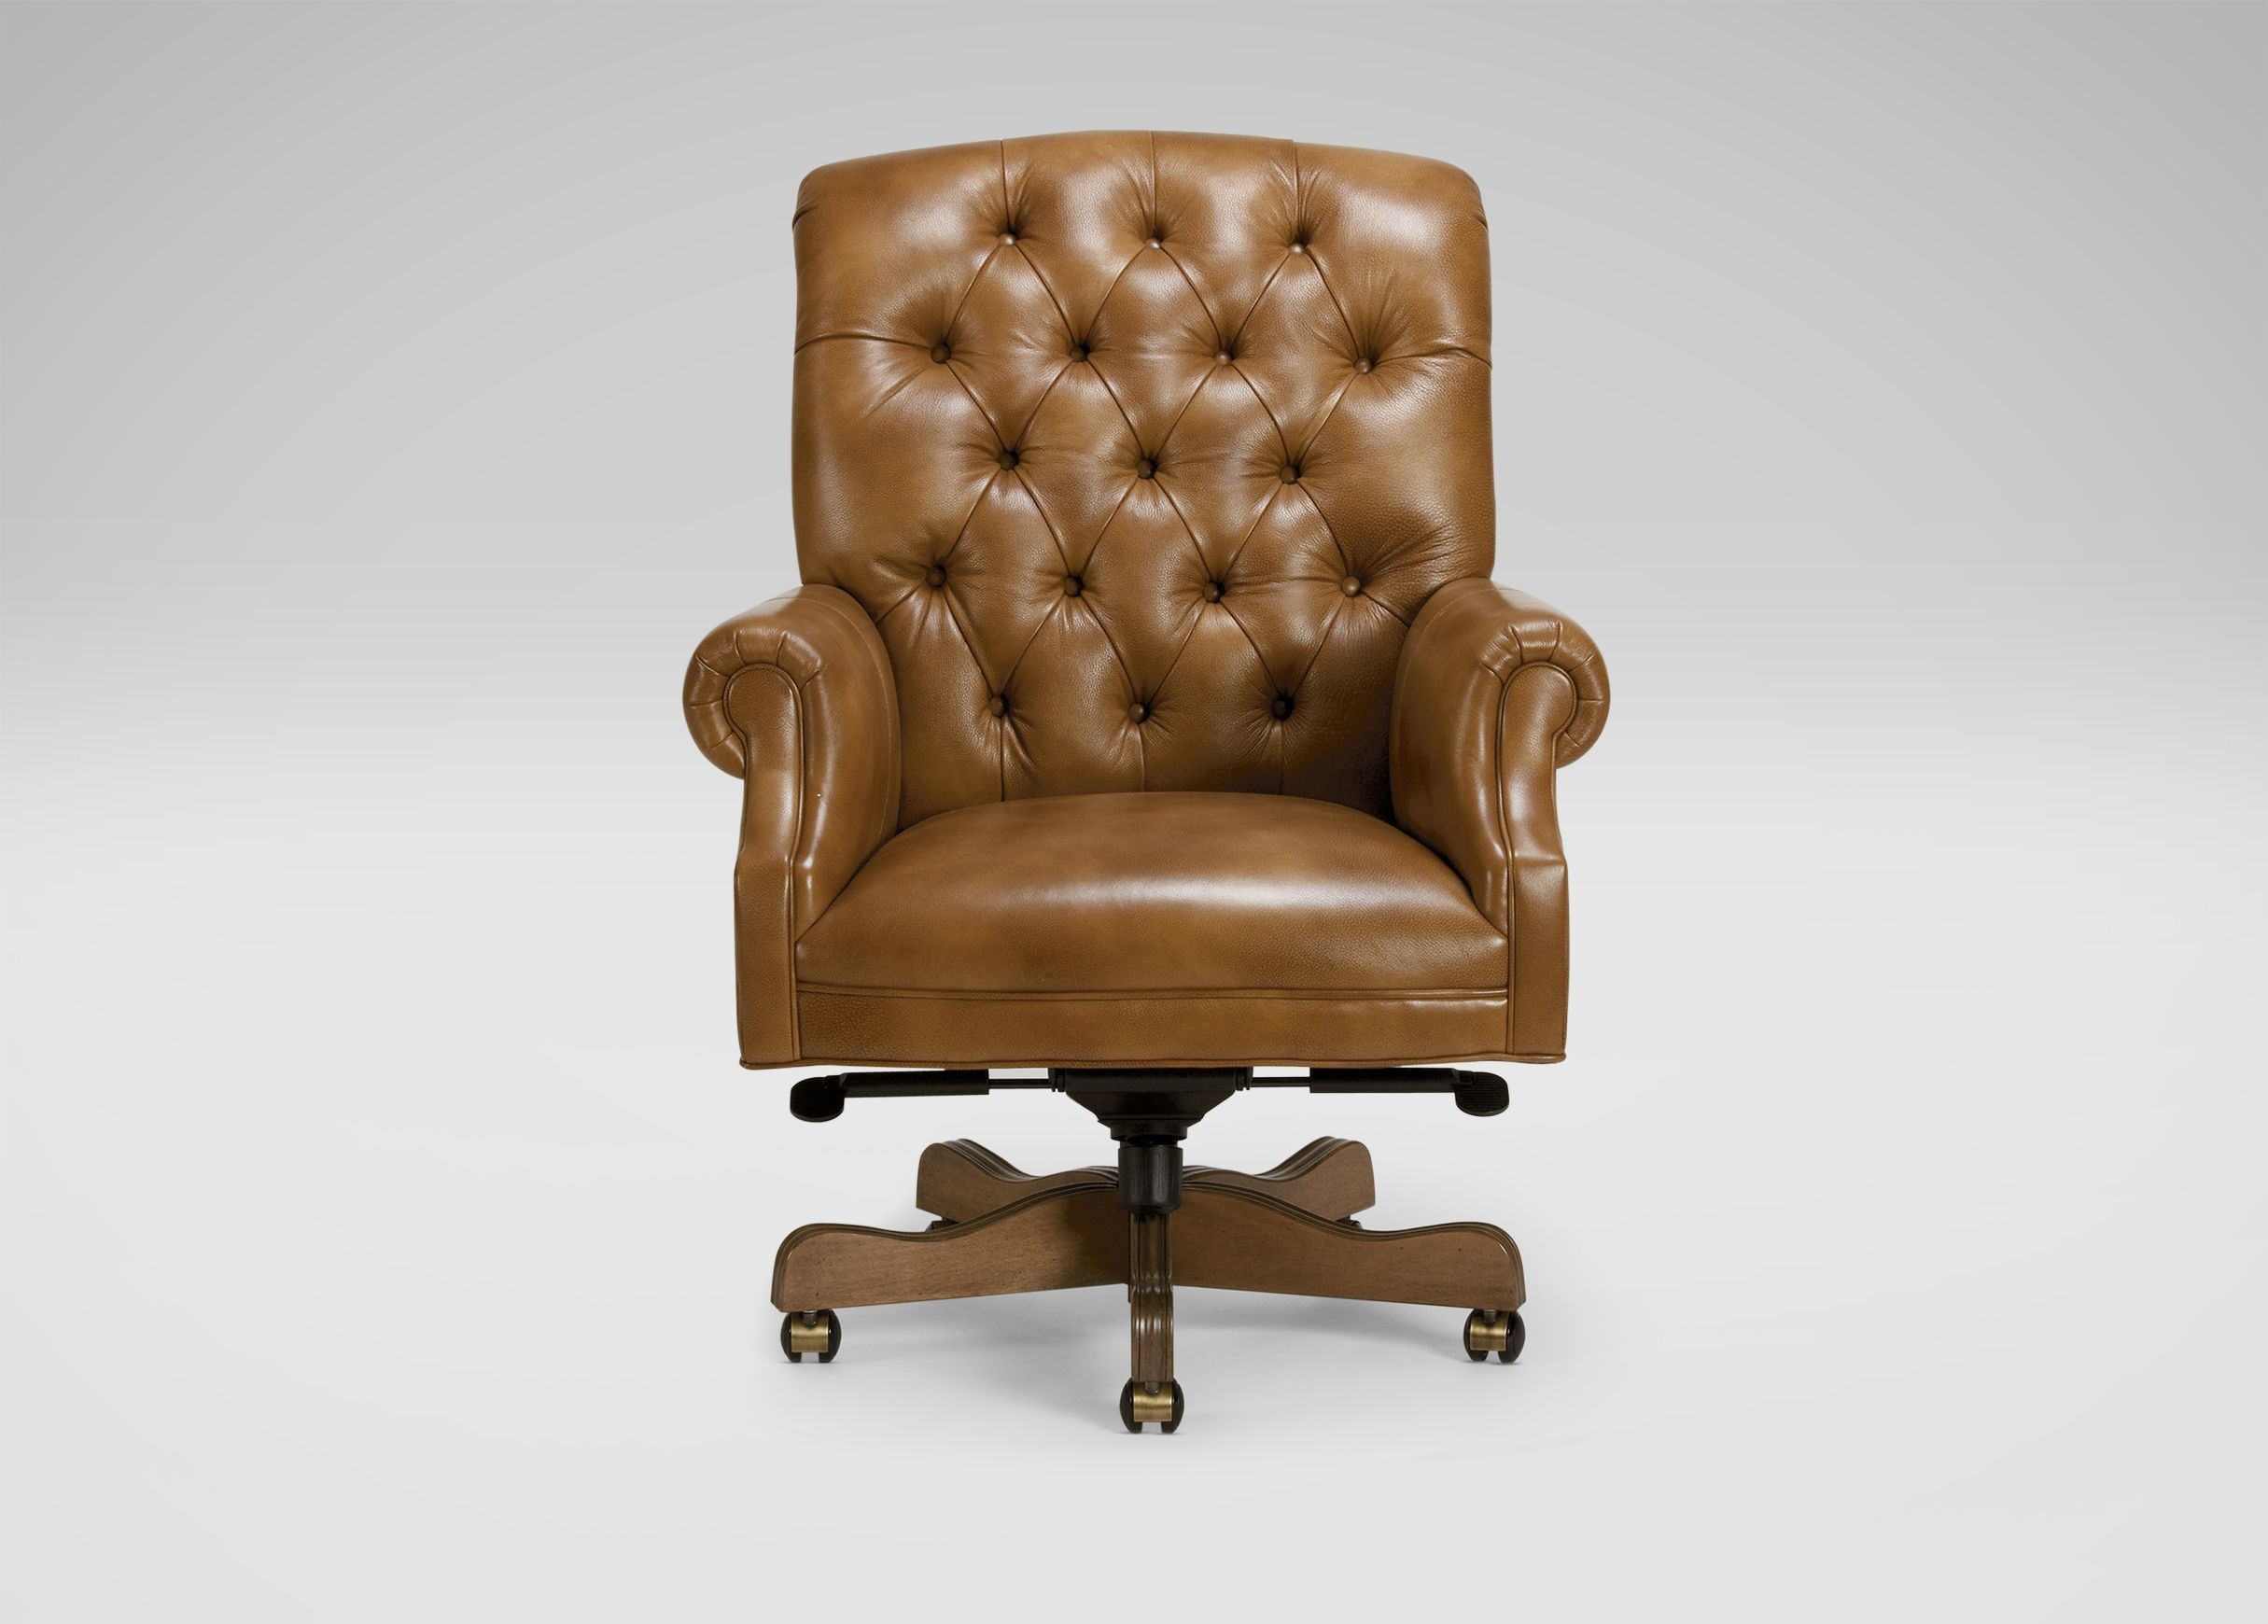 ethan allen leather desk chair http devintavern com pinterest